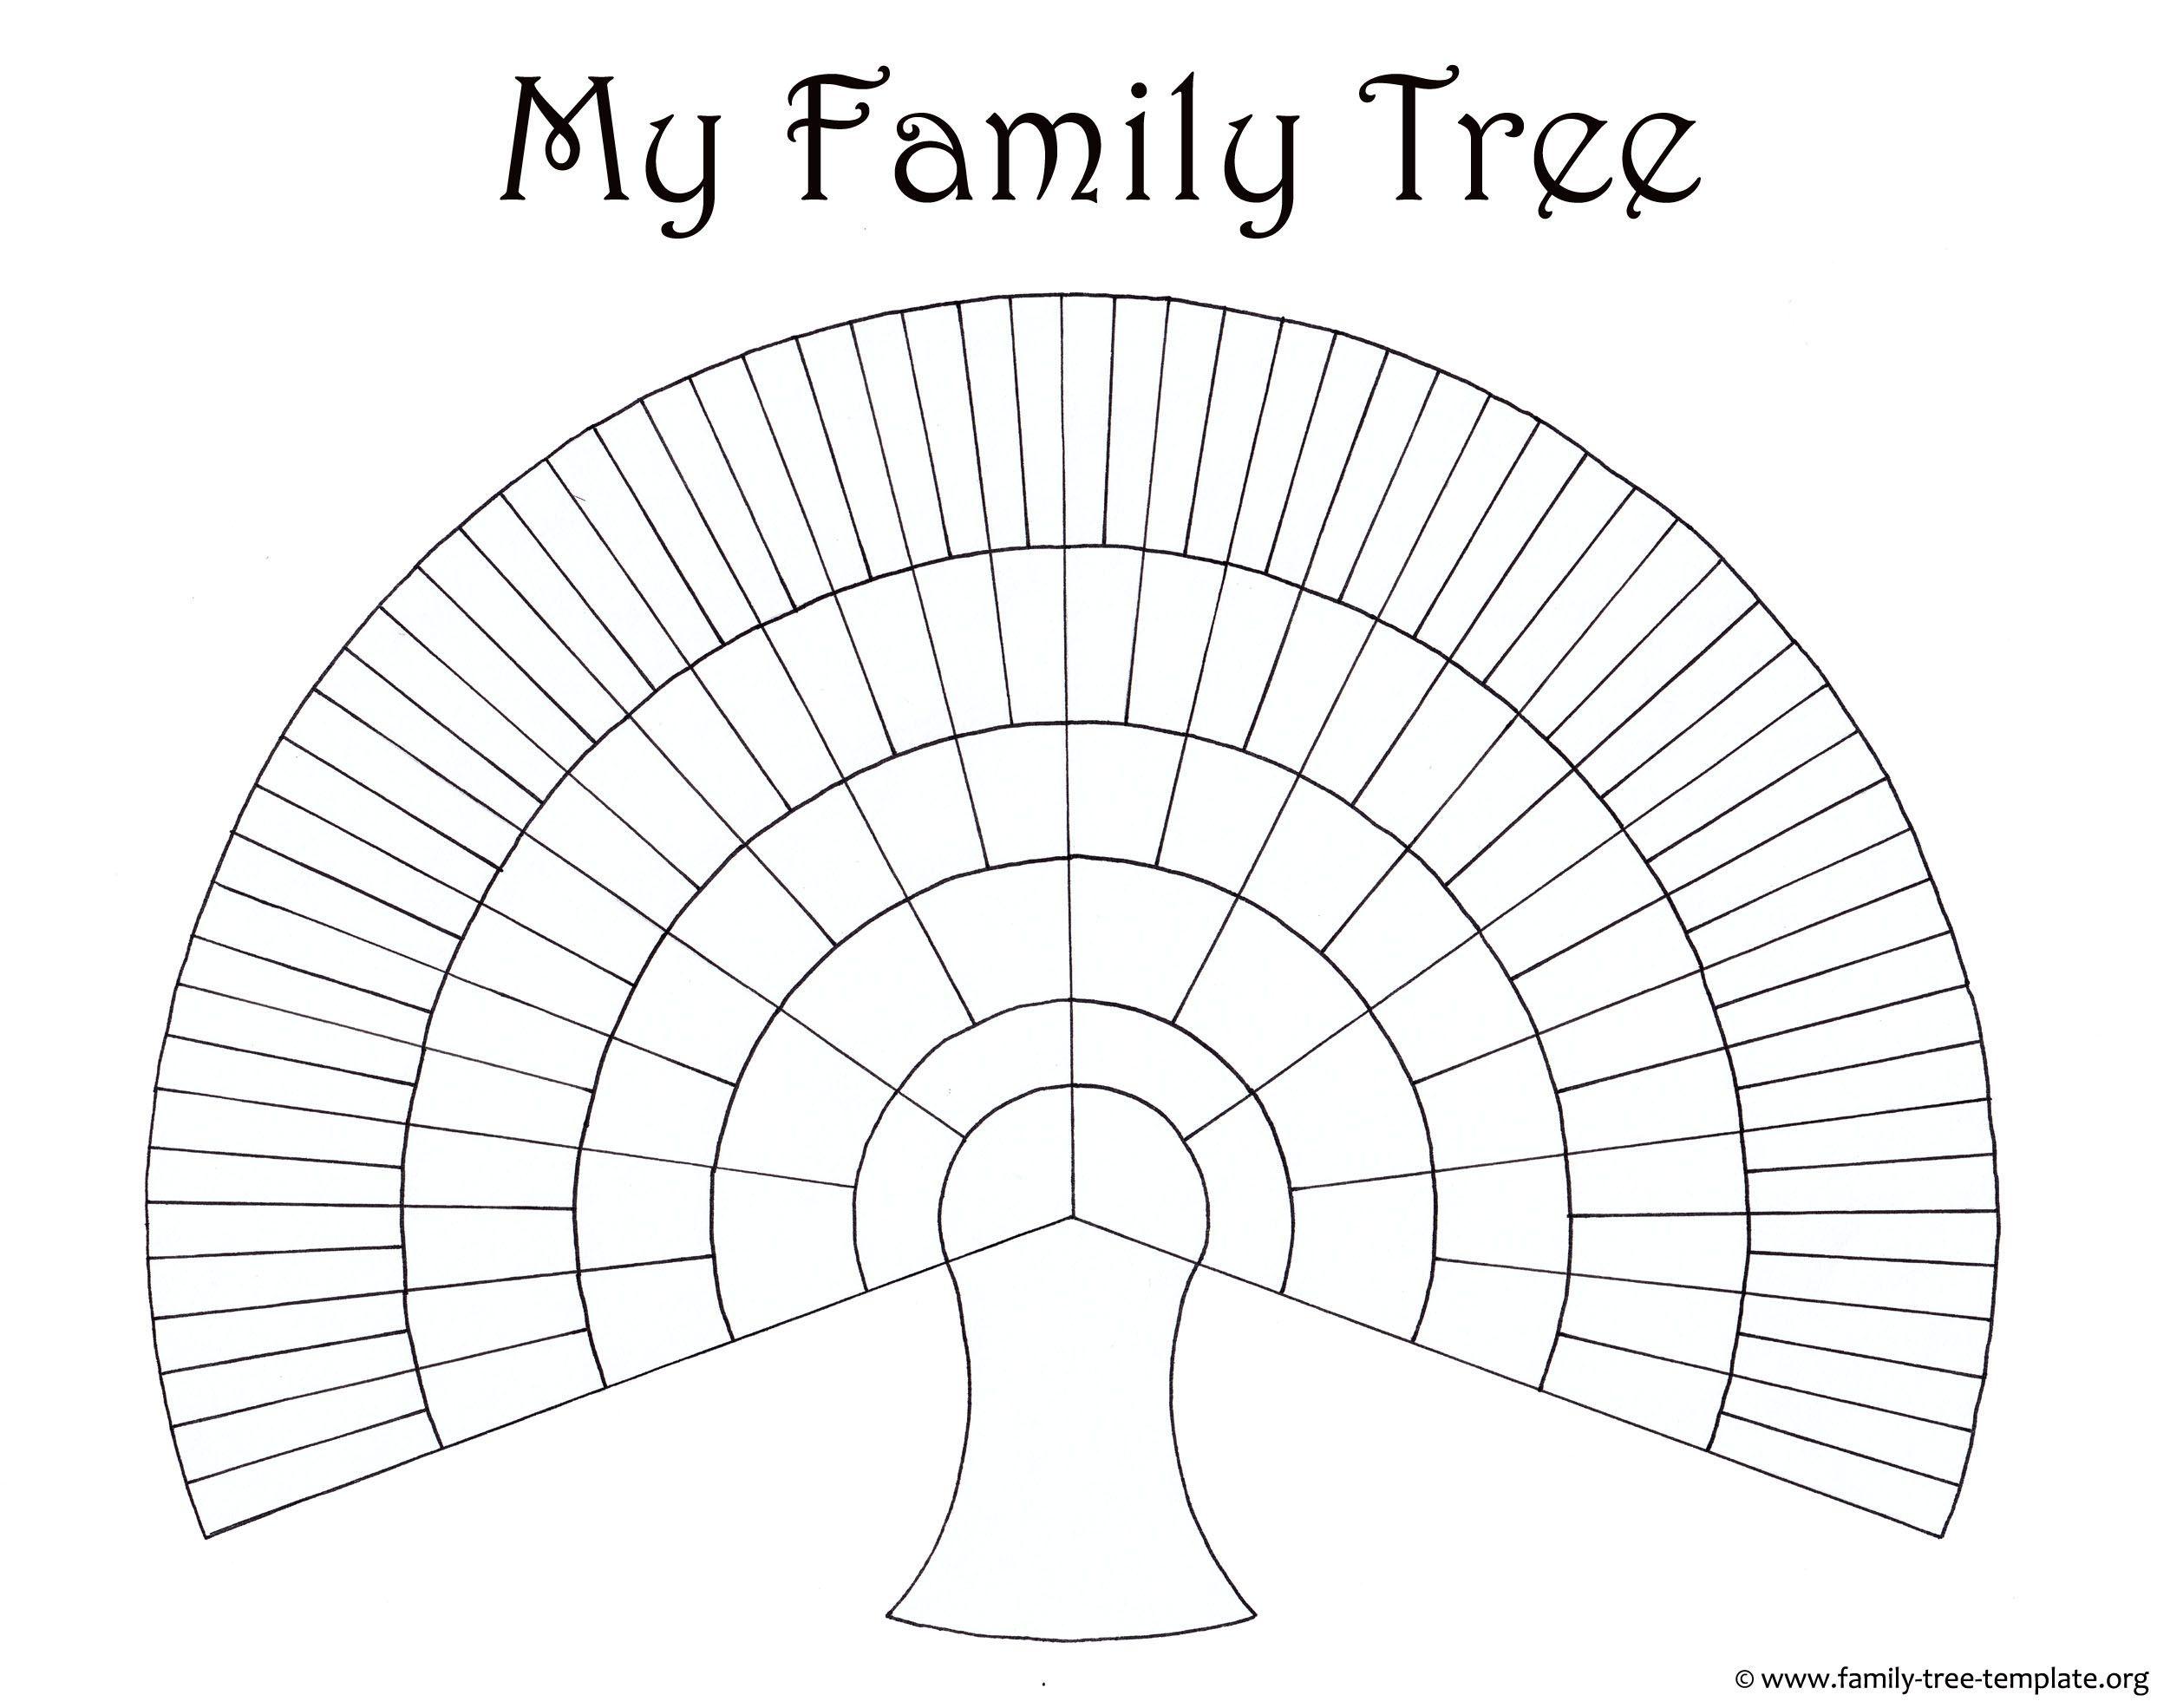 Blank Family Tree Template Genealogy Pinterest Family Trees